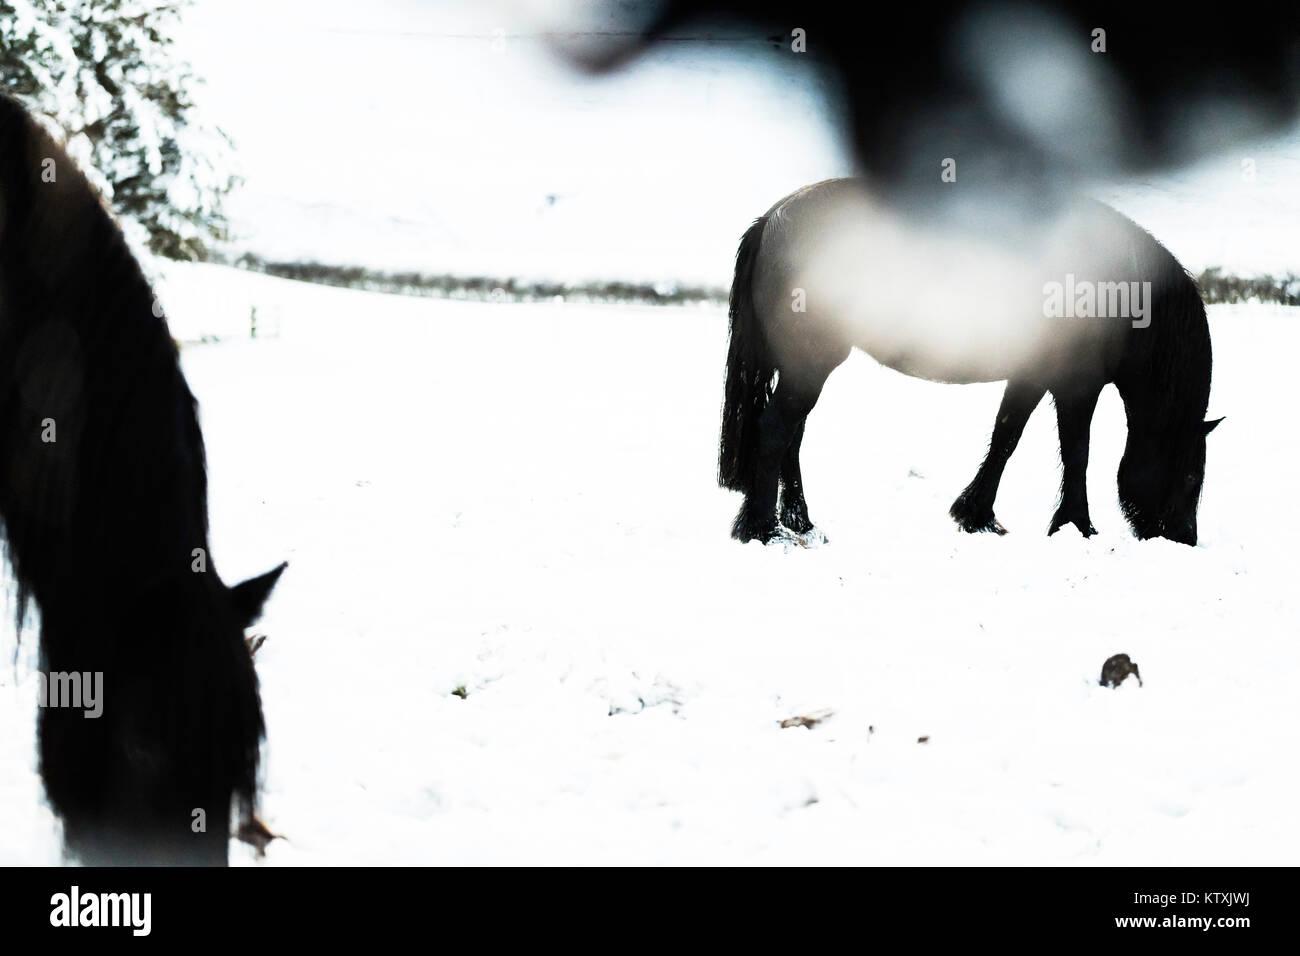 Towford, Jedburgh, Scottish Borders, UK. 26th December 2017. Fell ponies graze amongst deep snow on Boxing Day. - Stock Image